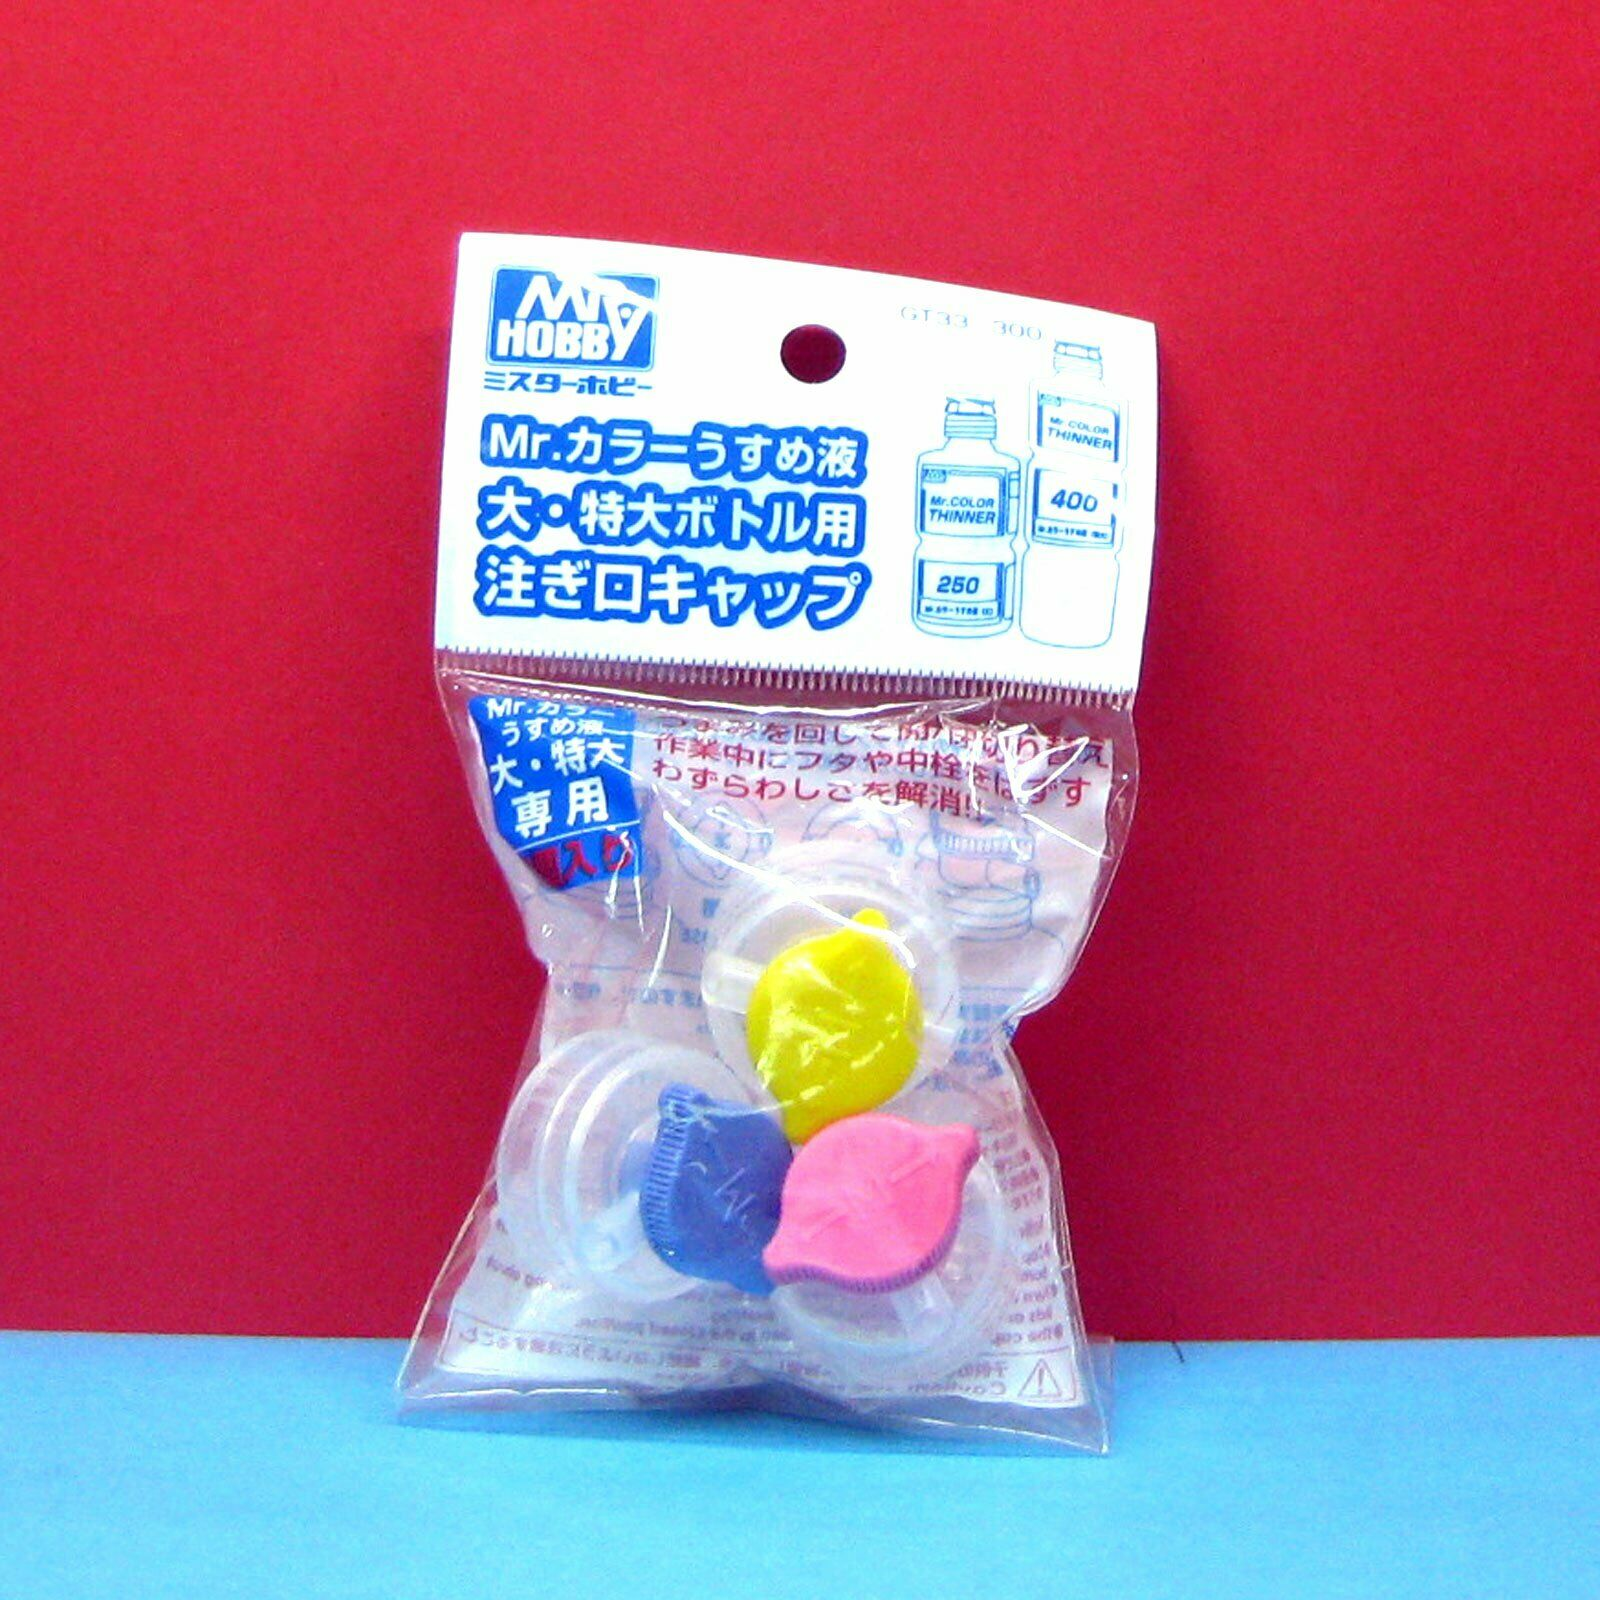 Hobby #GT33 Pourer Cap for Mr Mr GUNZE Color Thinner Bottle Big x 3pcs